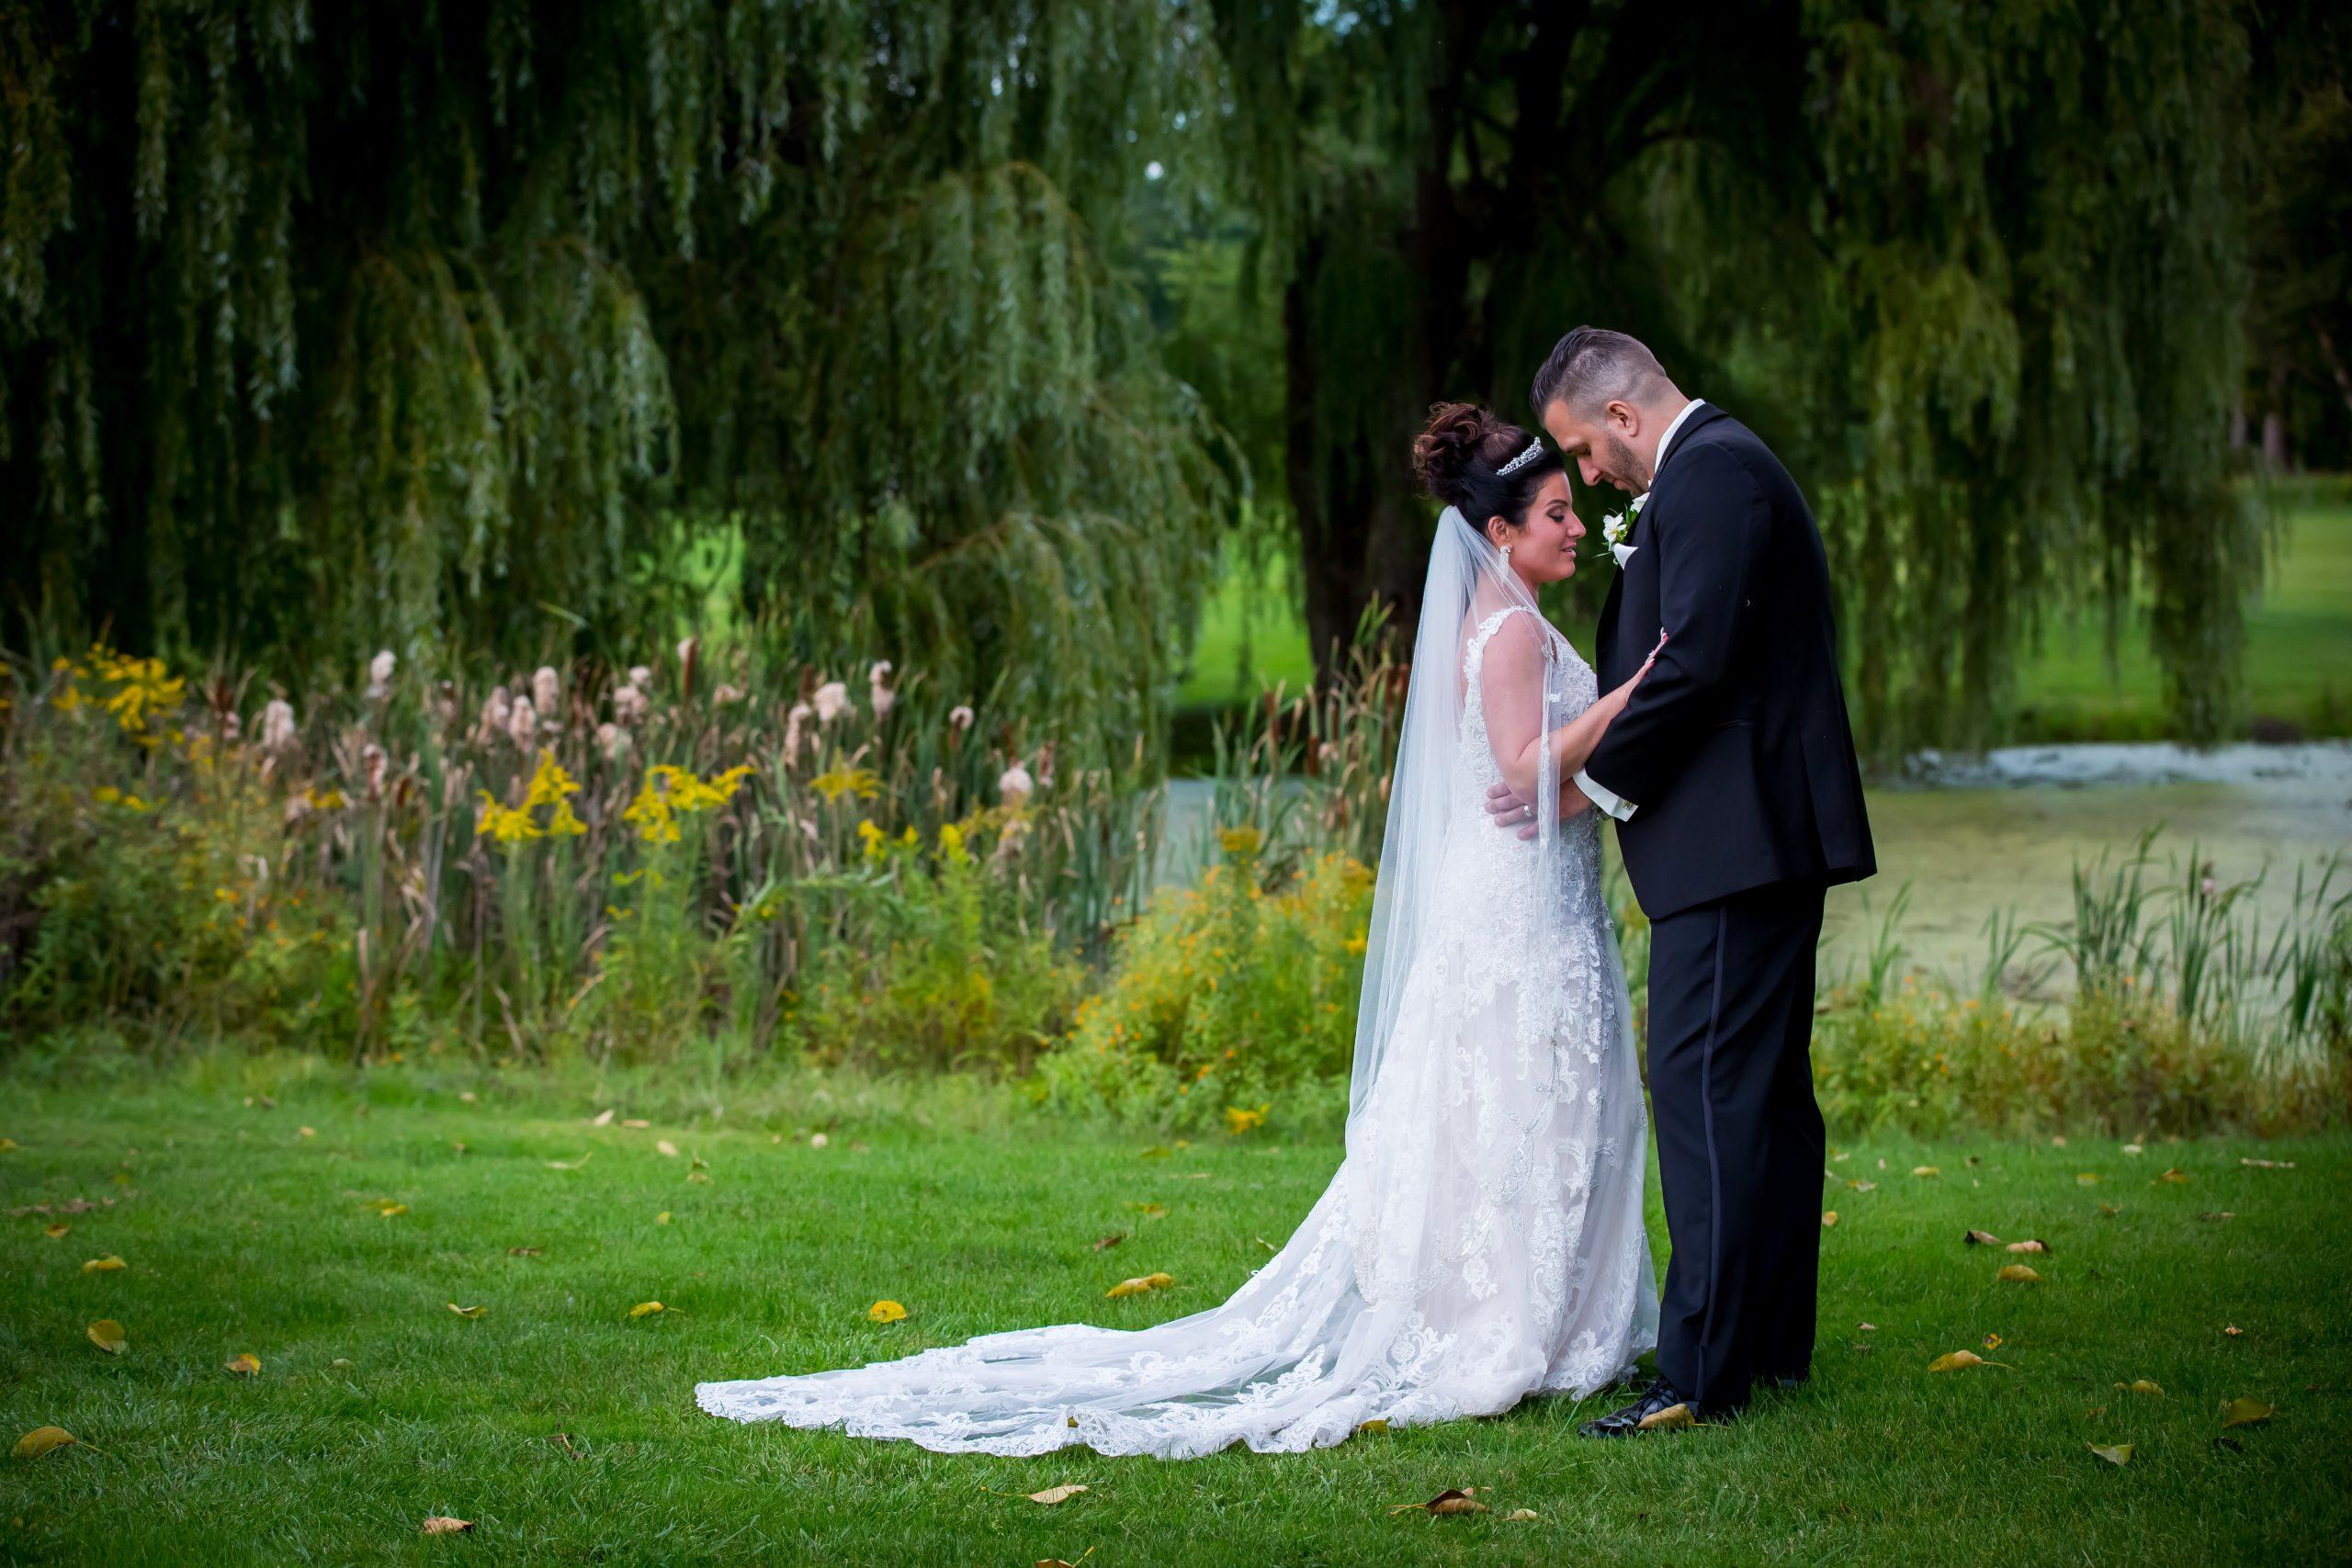 Victori_Rob_Mohawk River Country Club Wedding-41.jpg